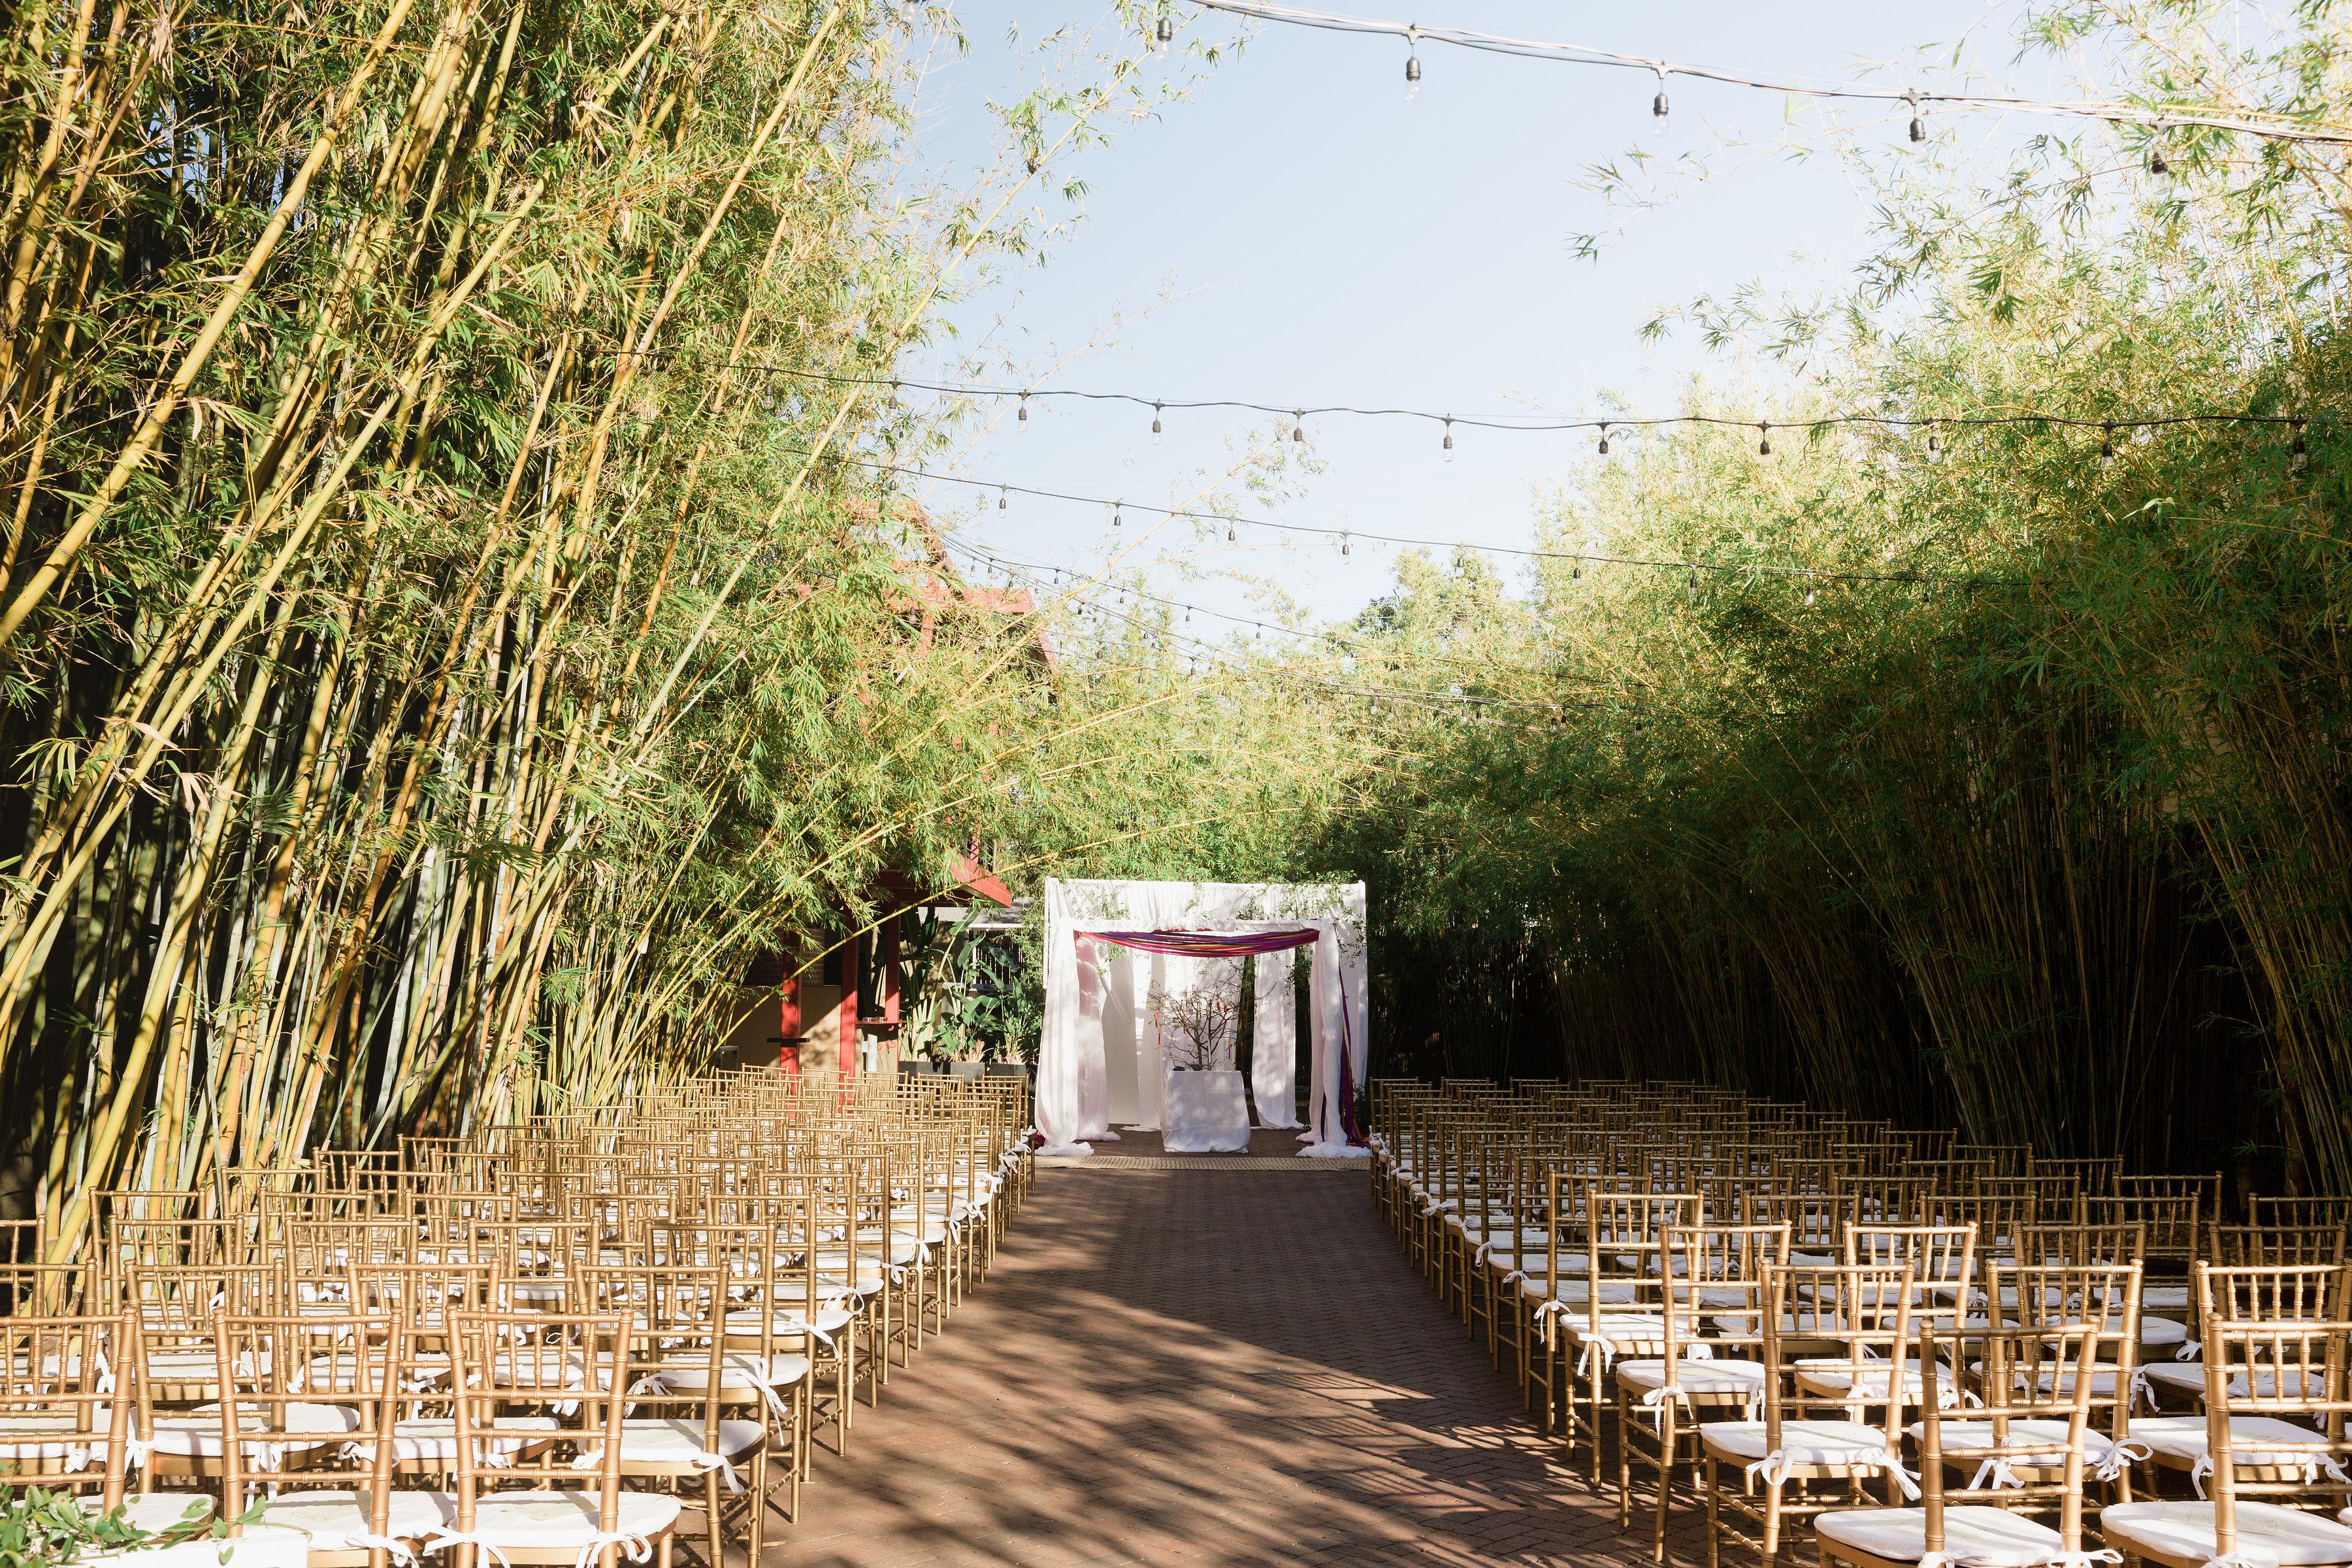 Ceremony in bamboo garden at NOVA 535 in St. Petersburg Florida